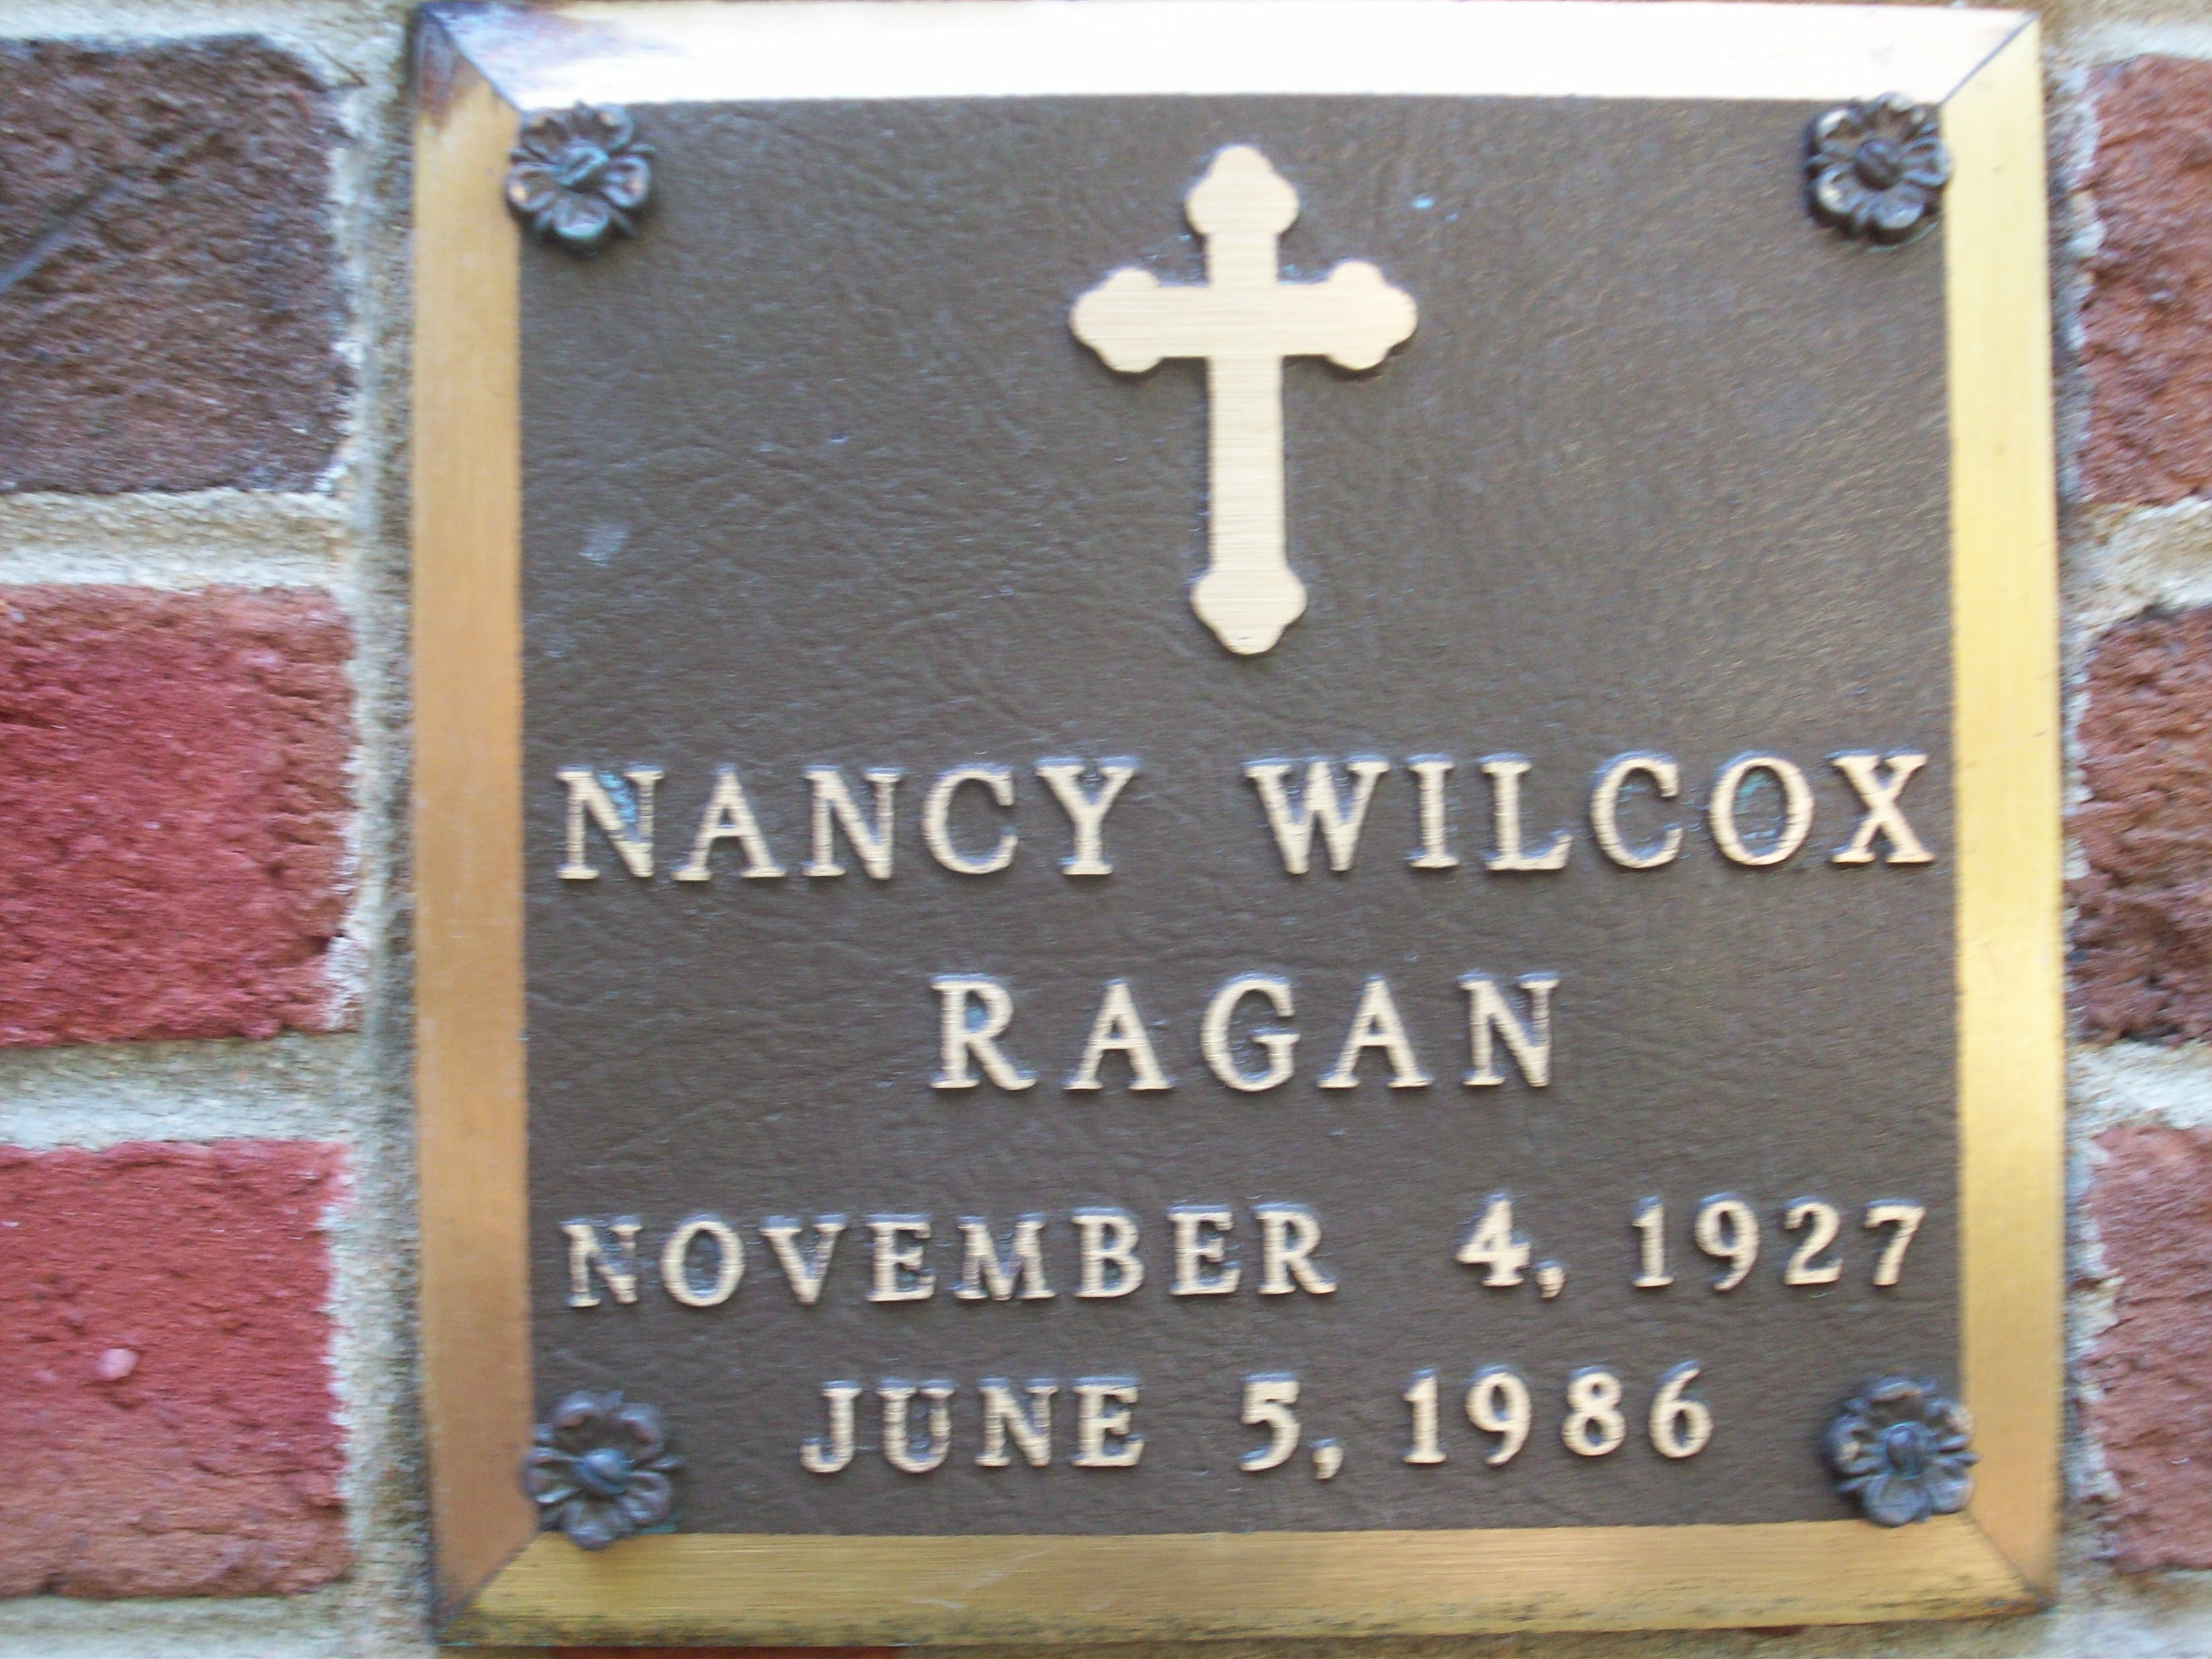 Nancy Wilcox Ragan